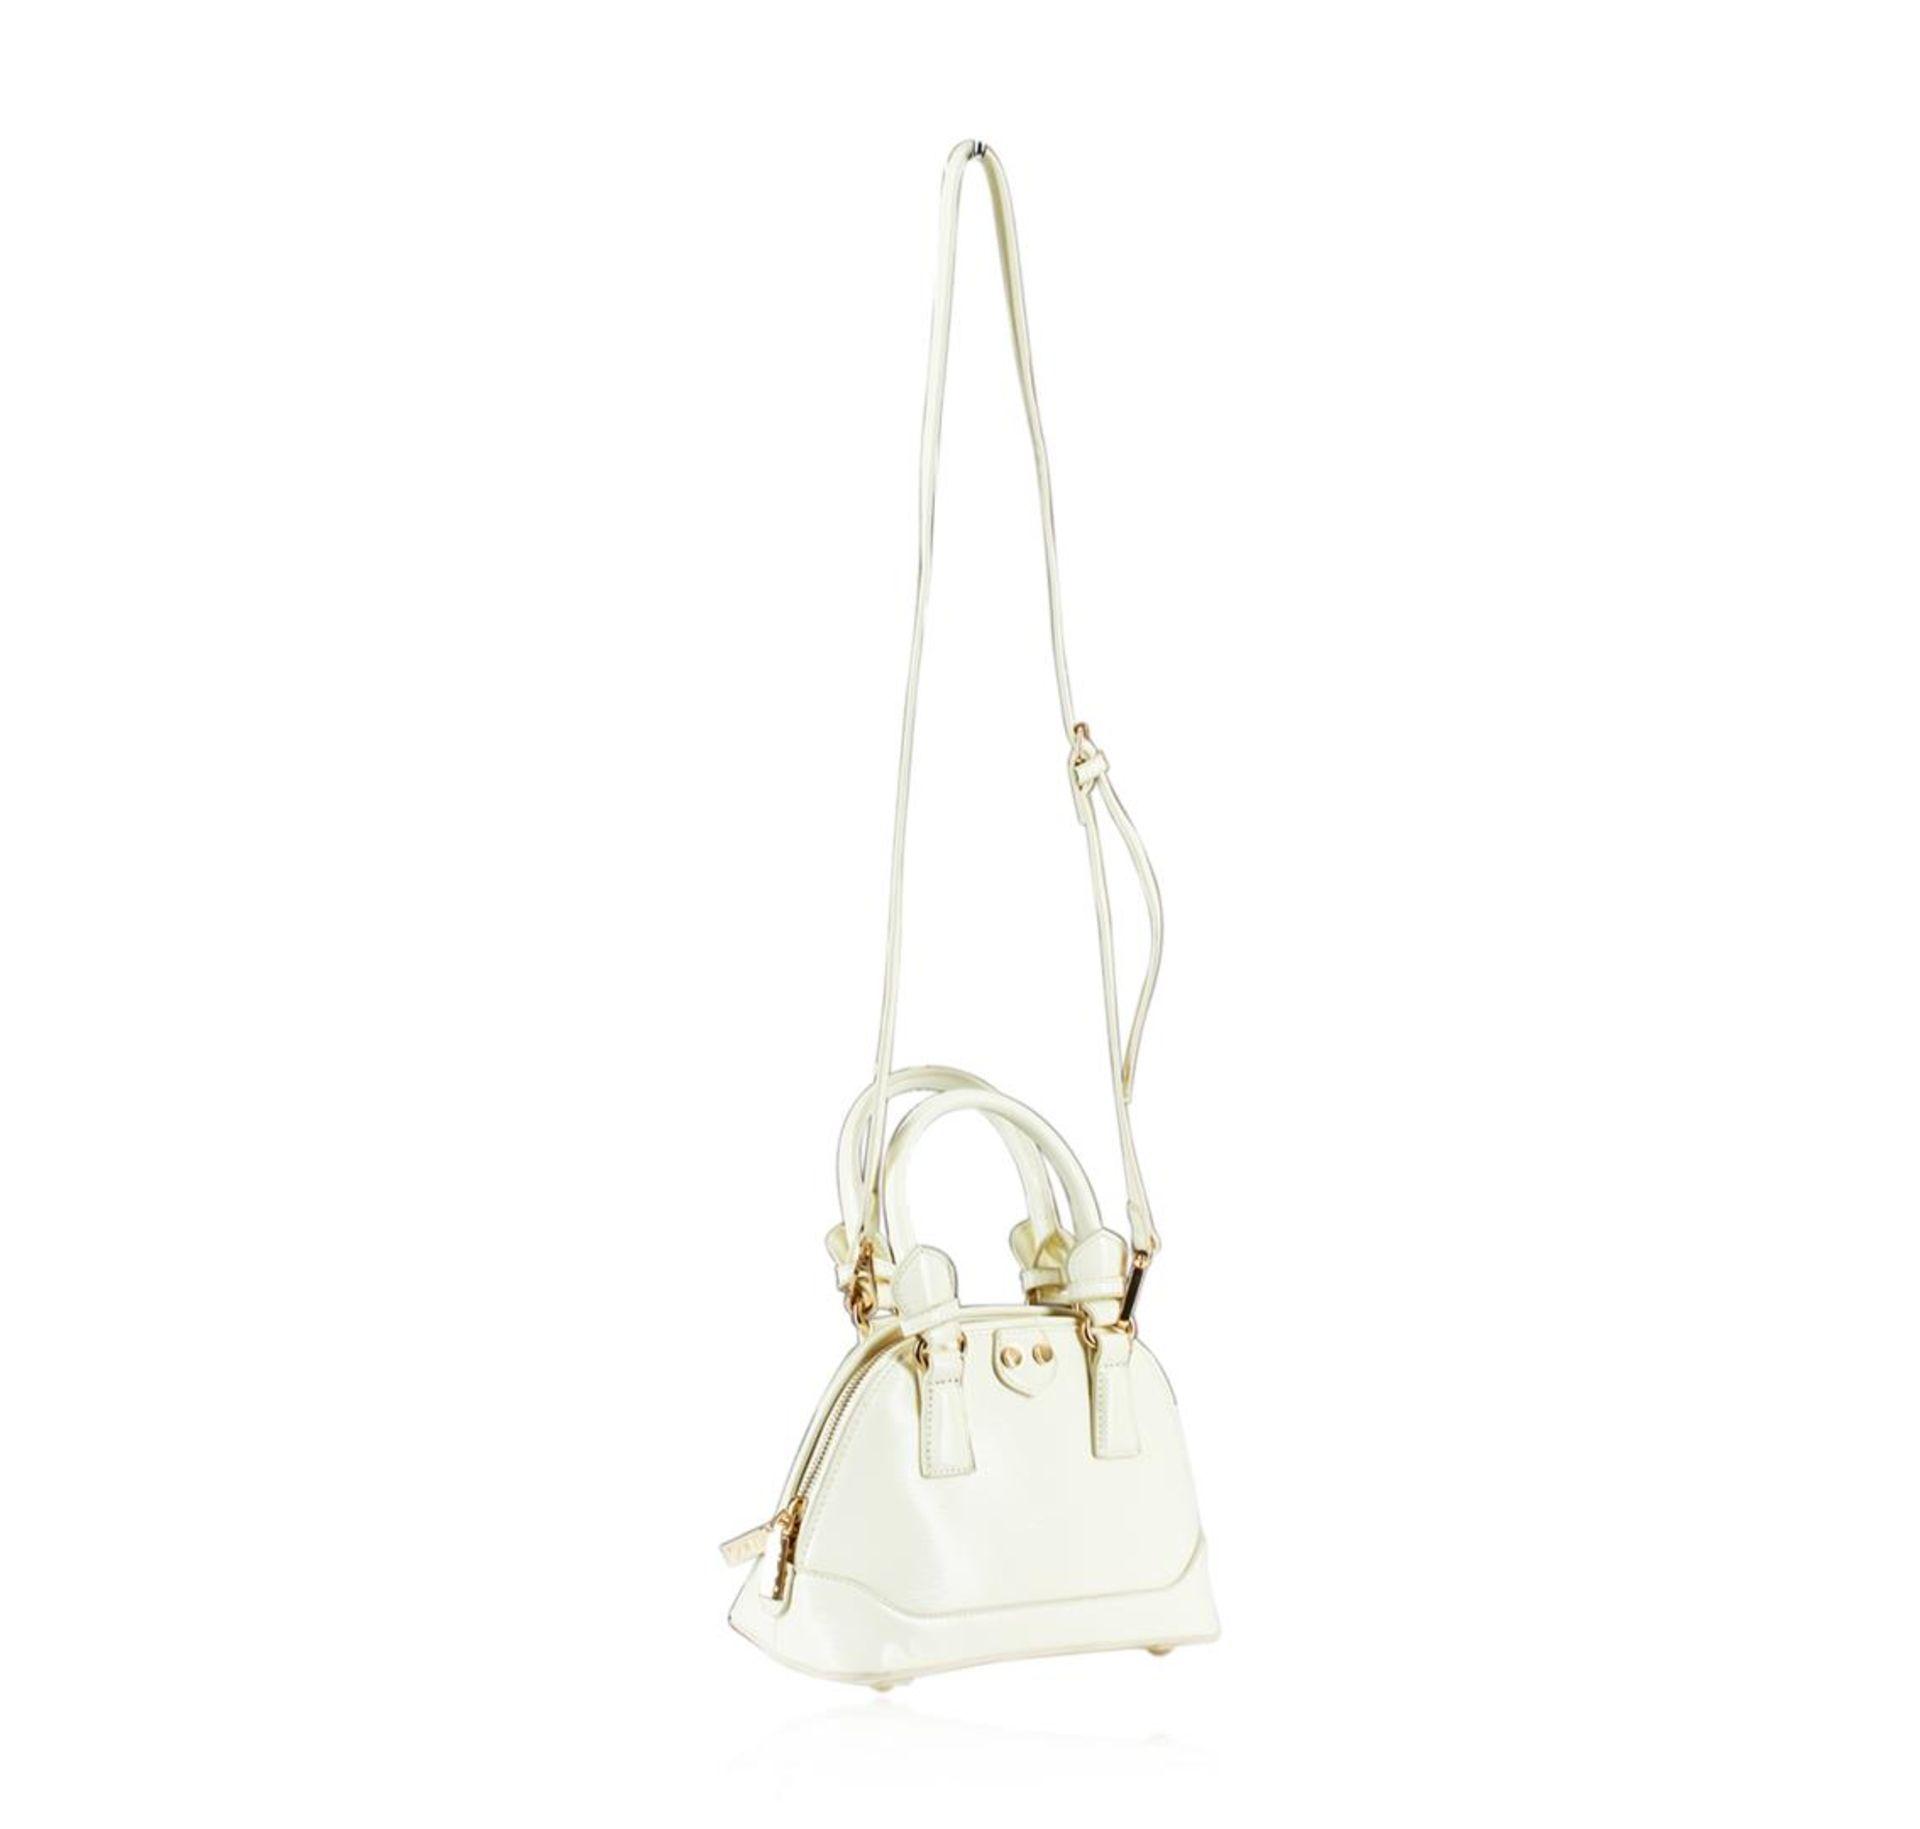 White Becca Mini Handbag - Image 3 of 3